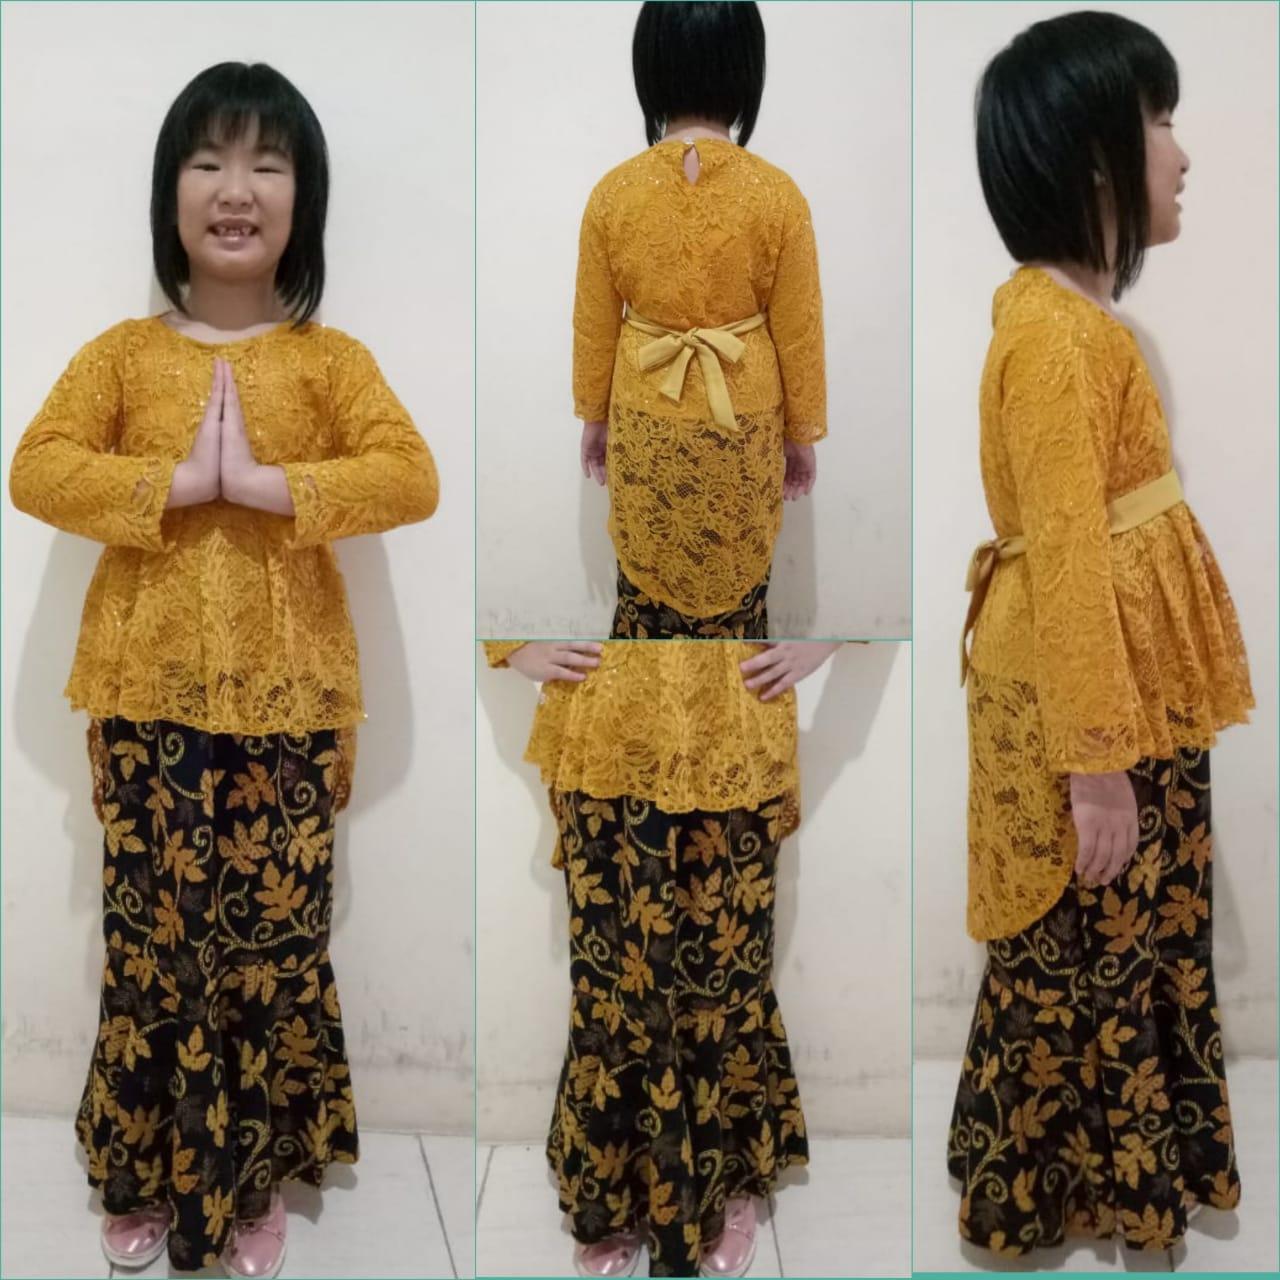 SB Collection Stelan Atasan Gladis Kebaya Kartini Blouse Brukat Dan Rok Duyung Batik Anak Perempuan S M L XL Tersedia Warna Navy Pink Gold